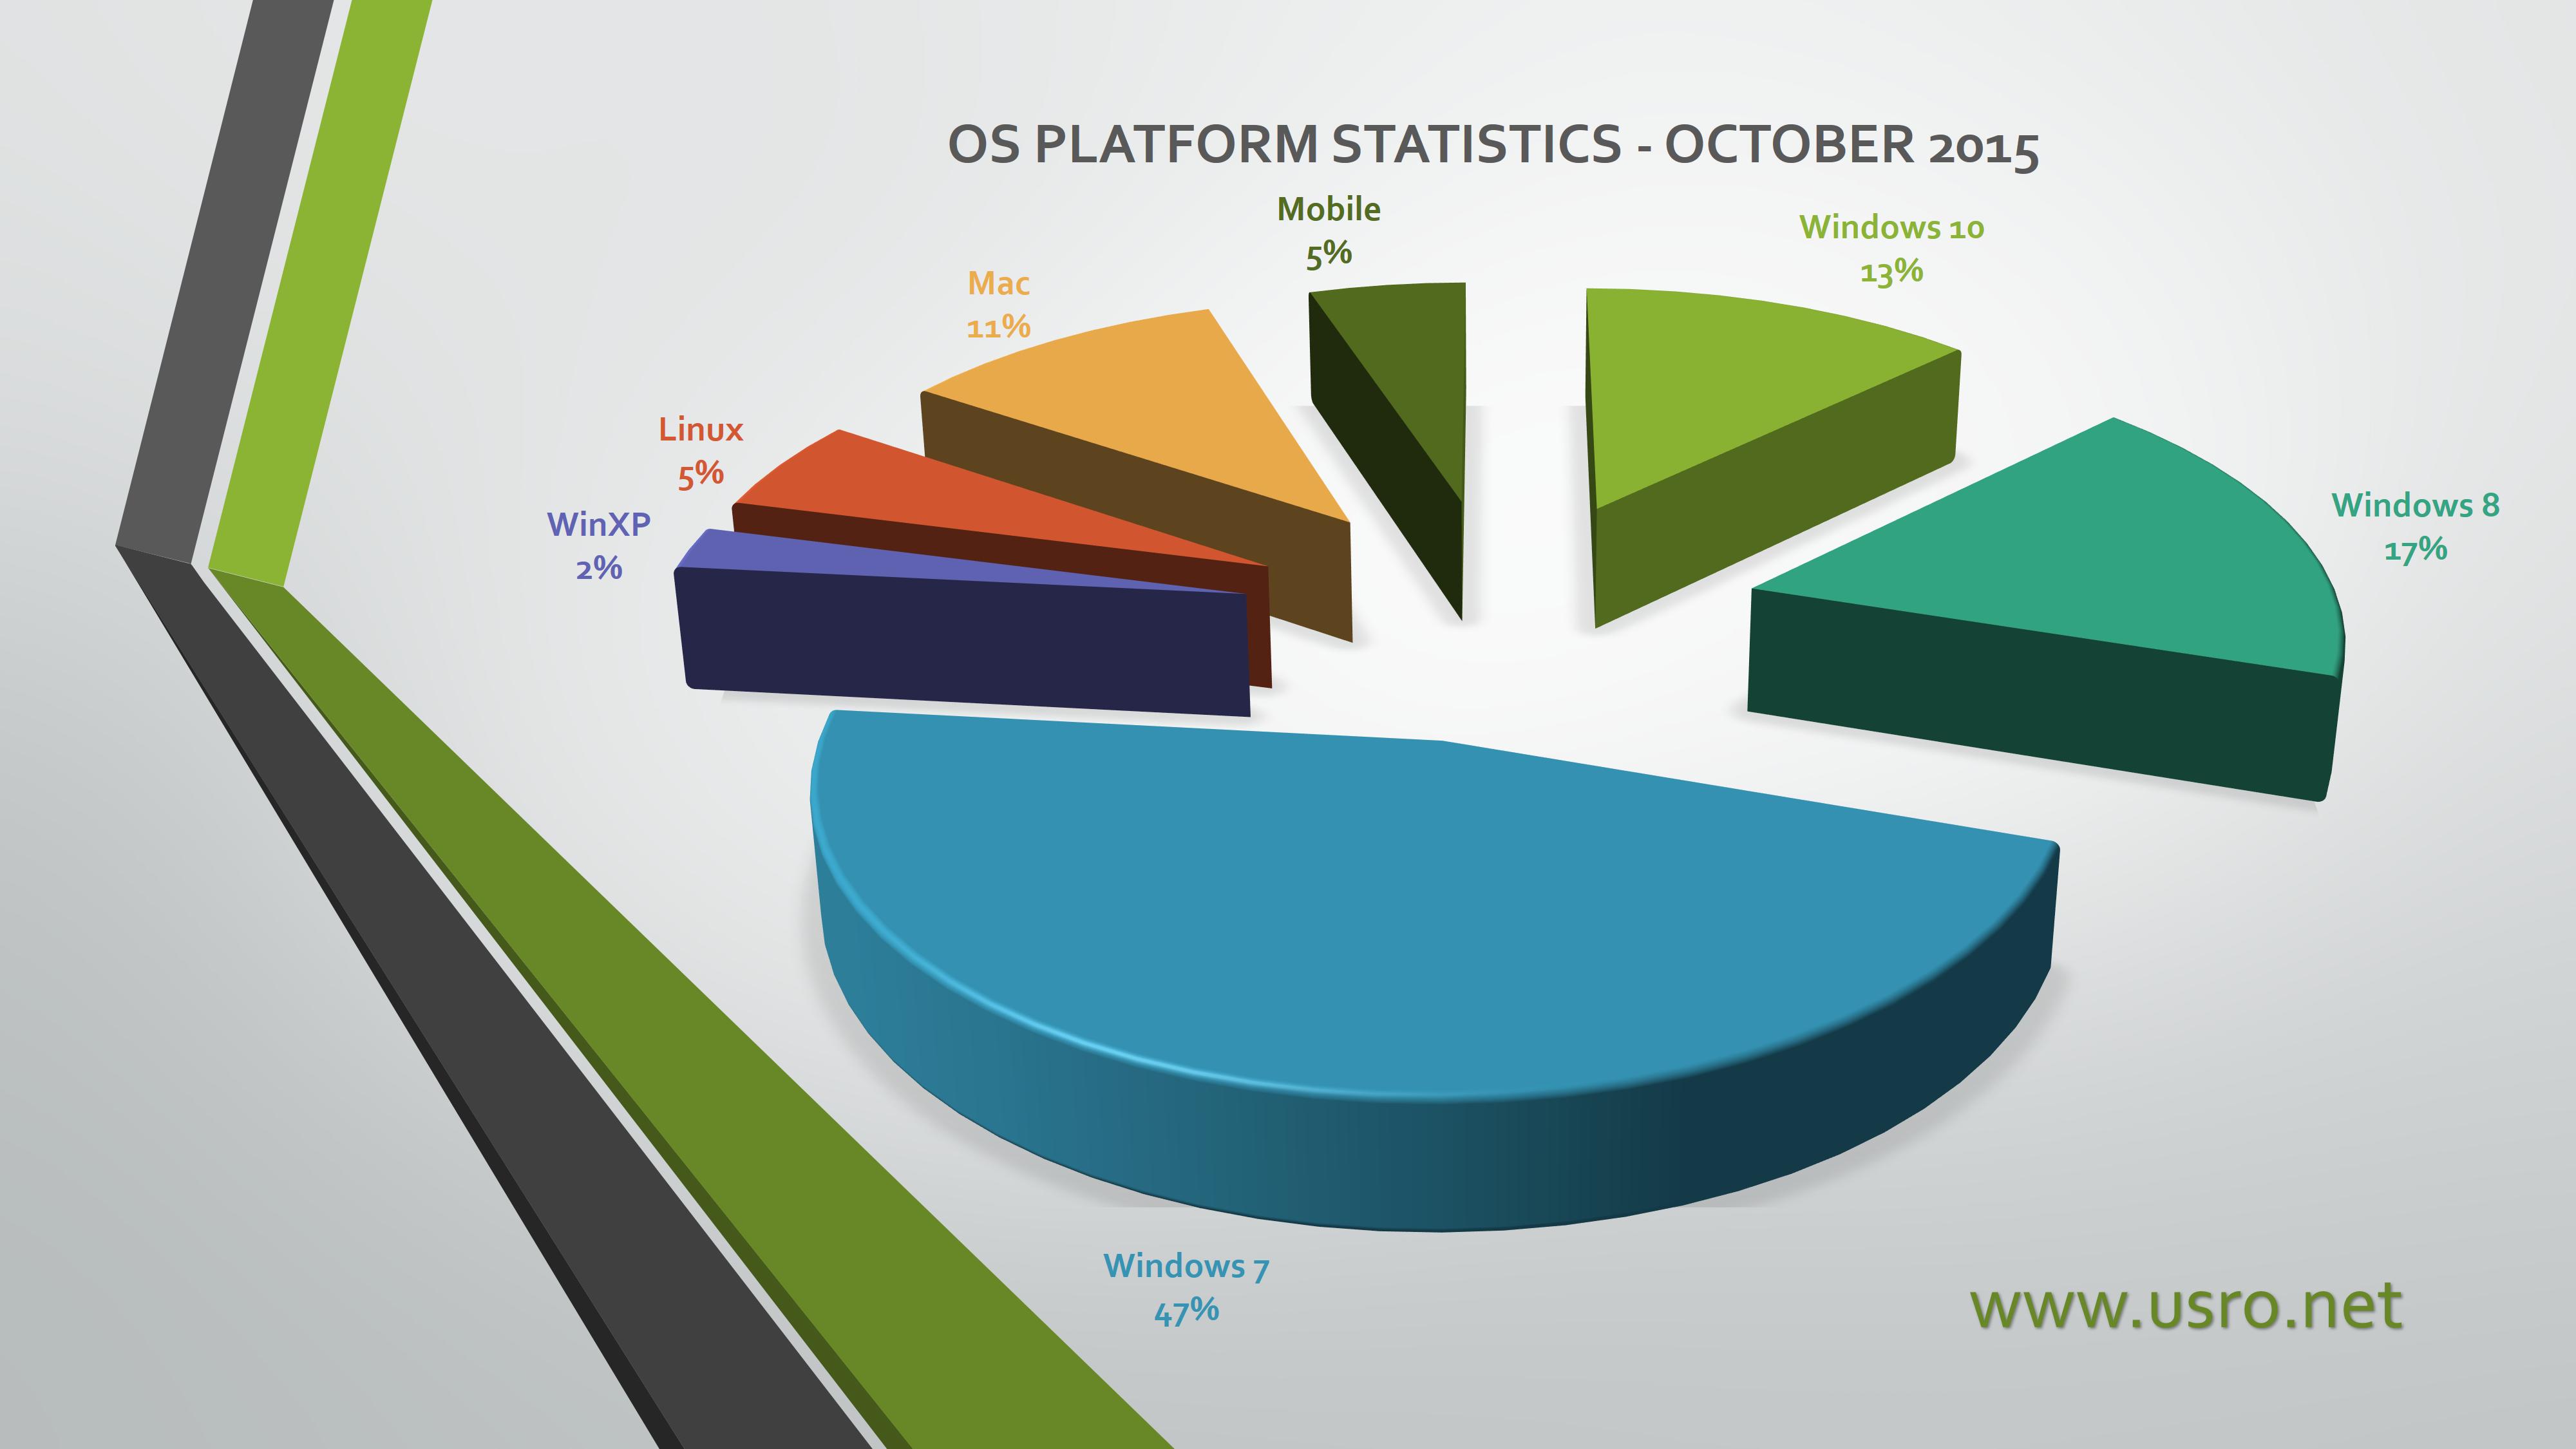 os platform usage statistics october 2015